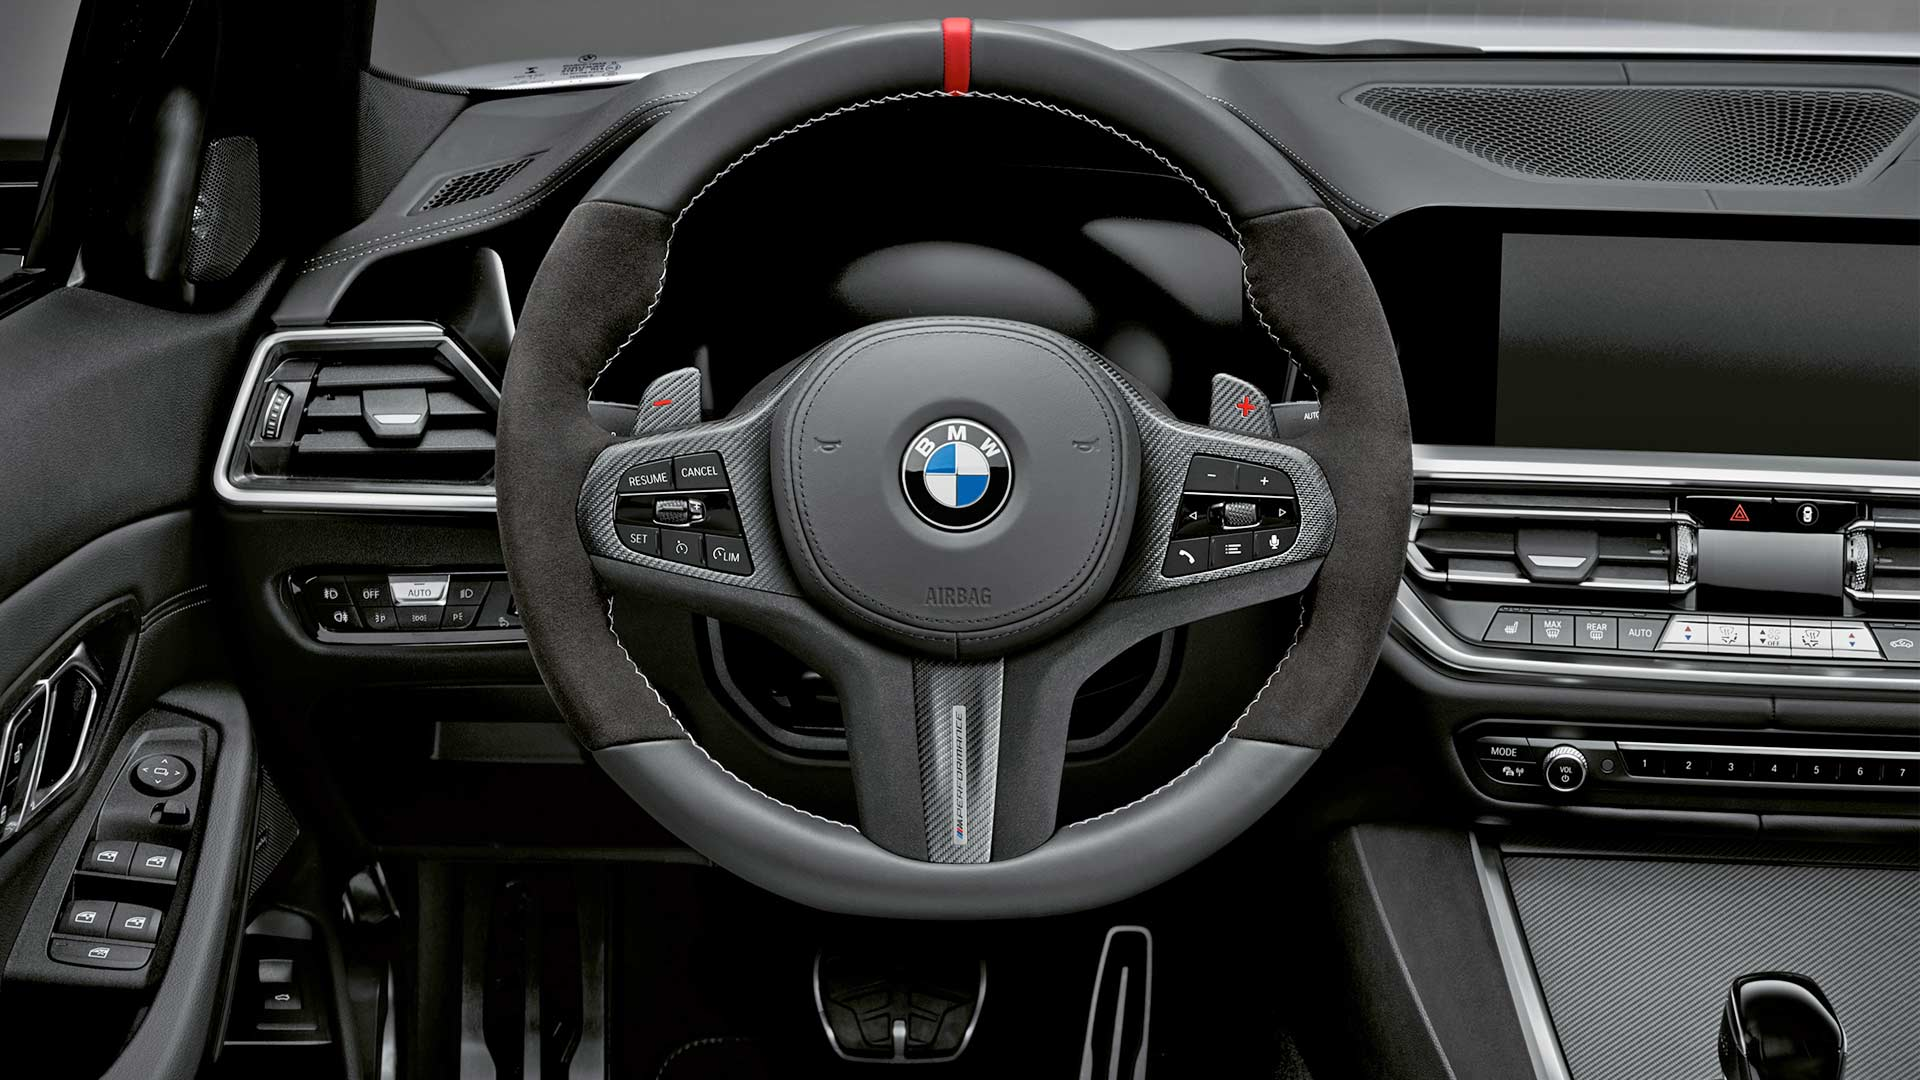 2019-BMW-3-Series-M-Performance-Parts-Interior_2